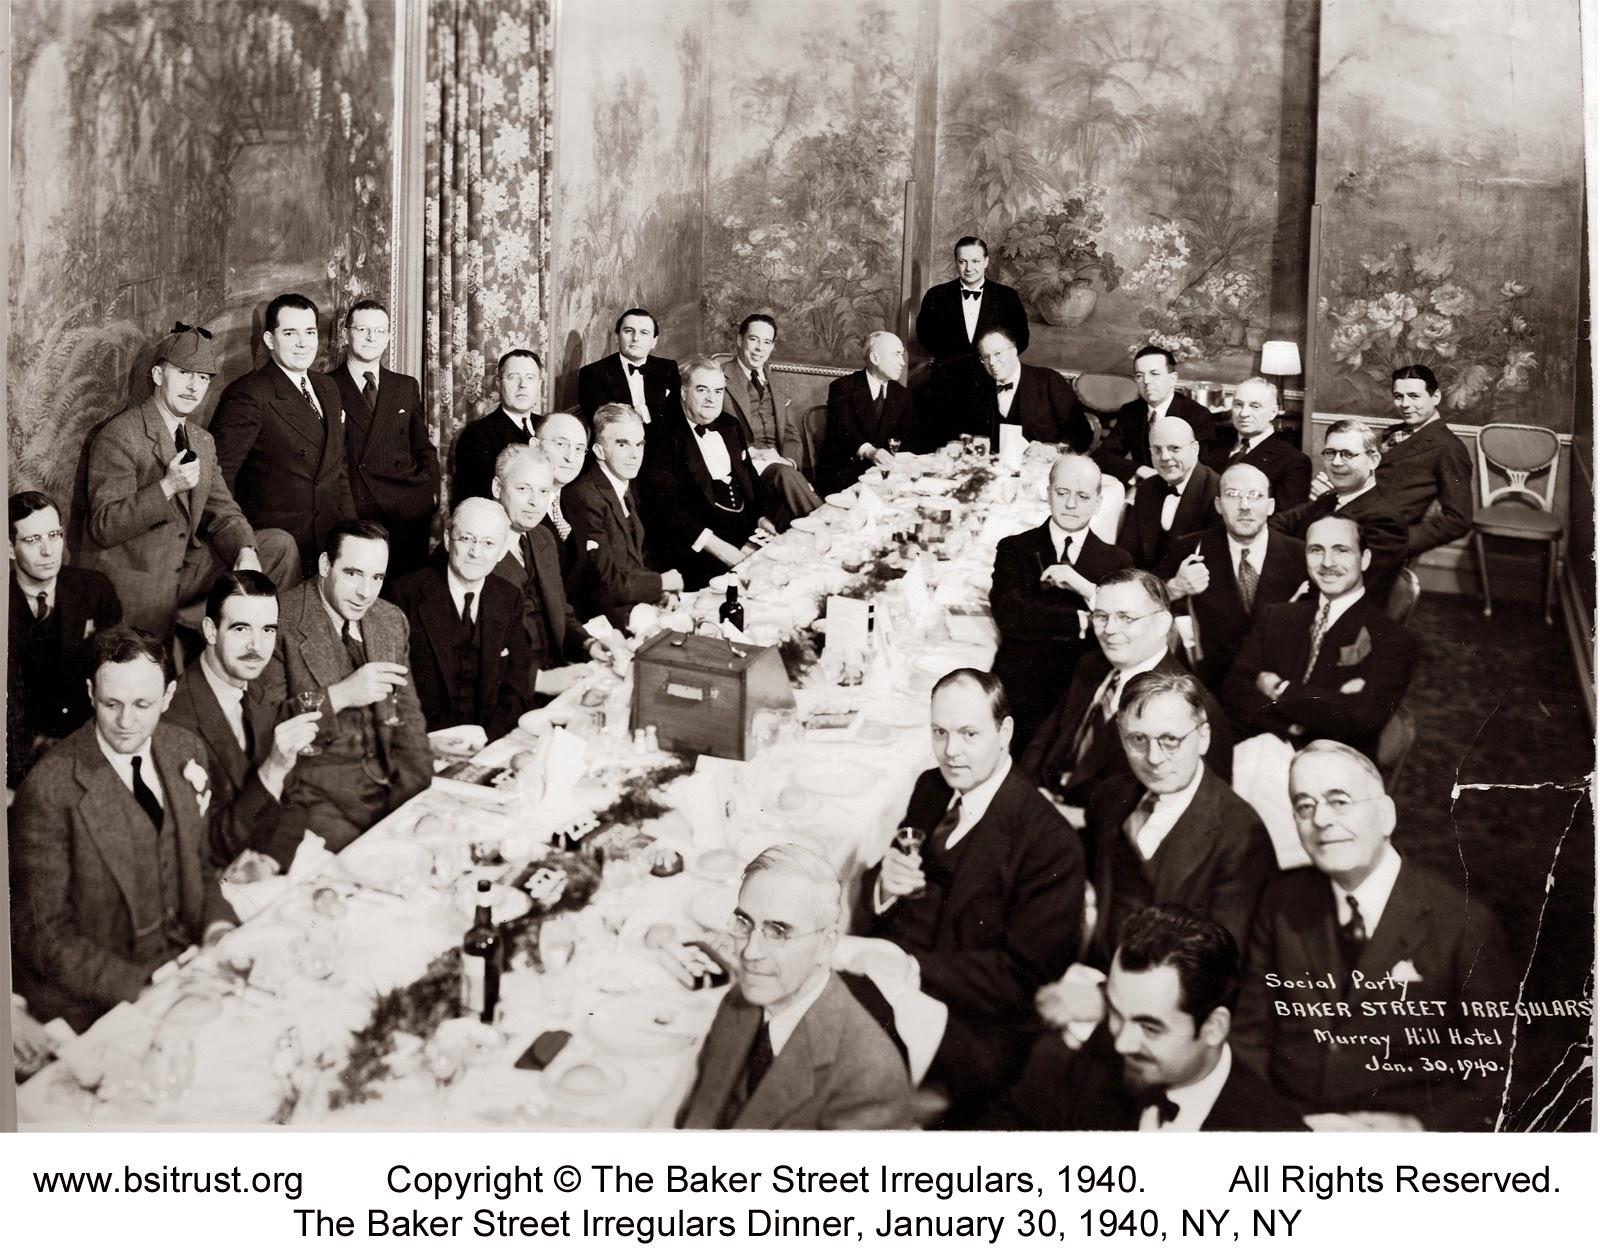 The 1940 BSI Dinner group photo